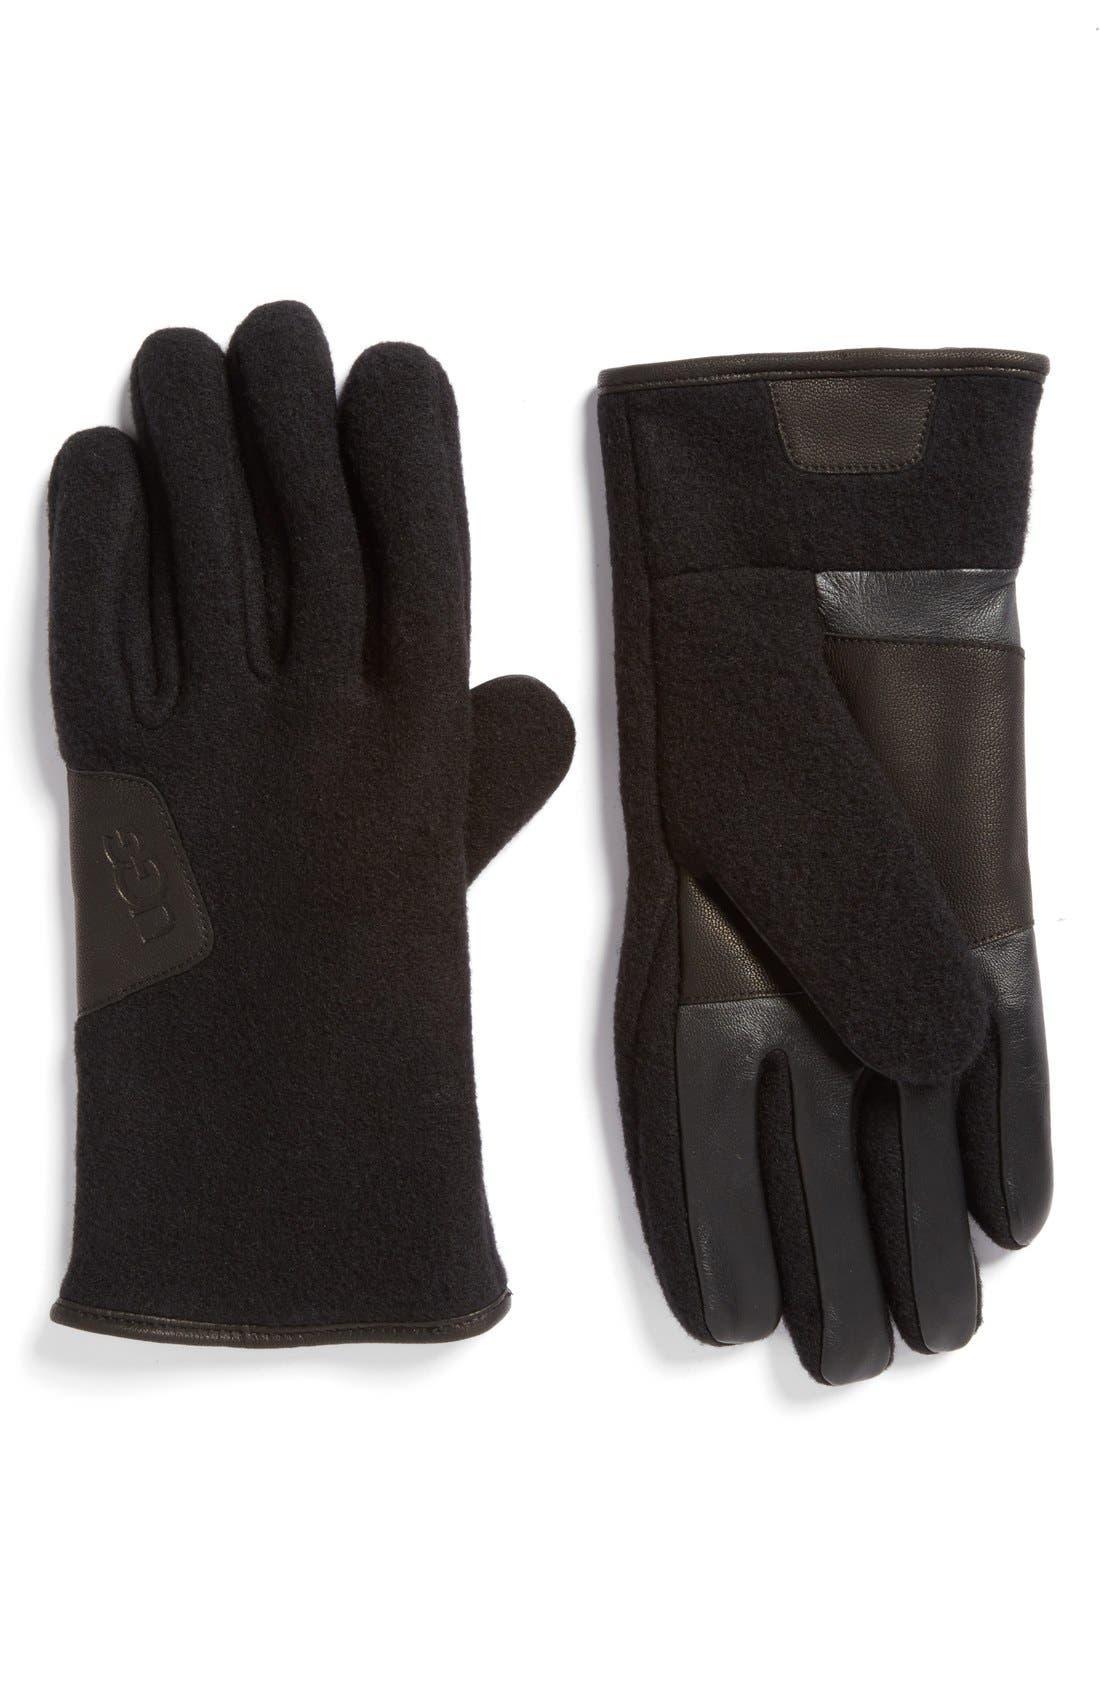 Wool Blend Tech Gloves,                         Main,                         color, Black